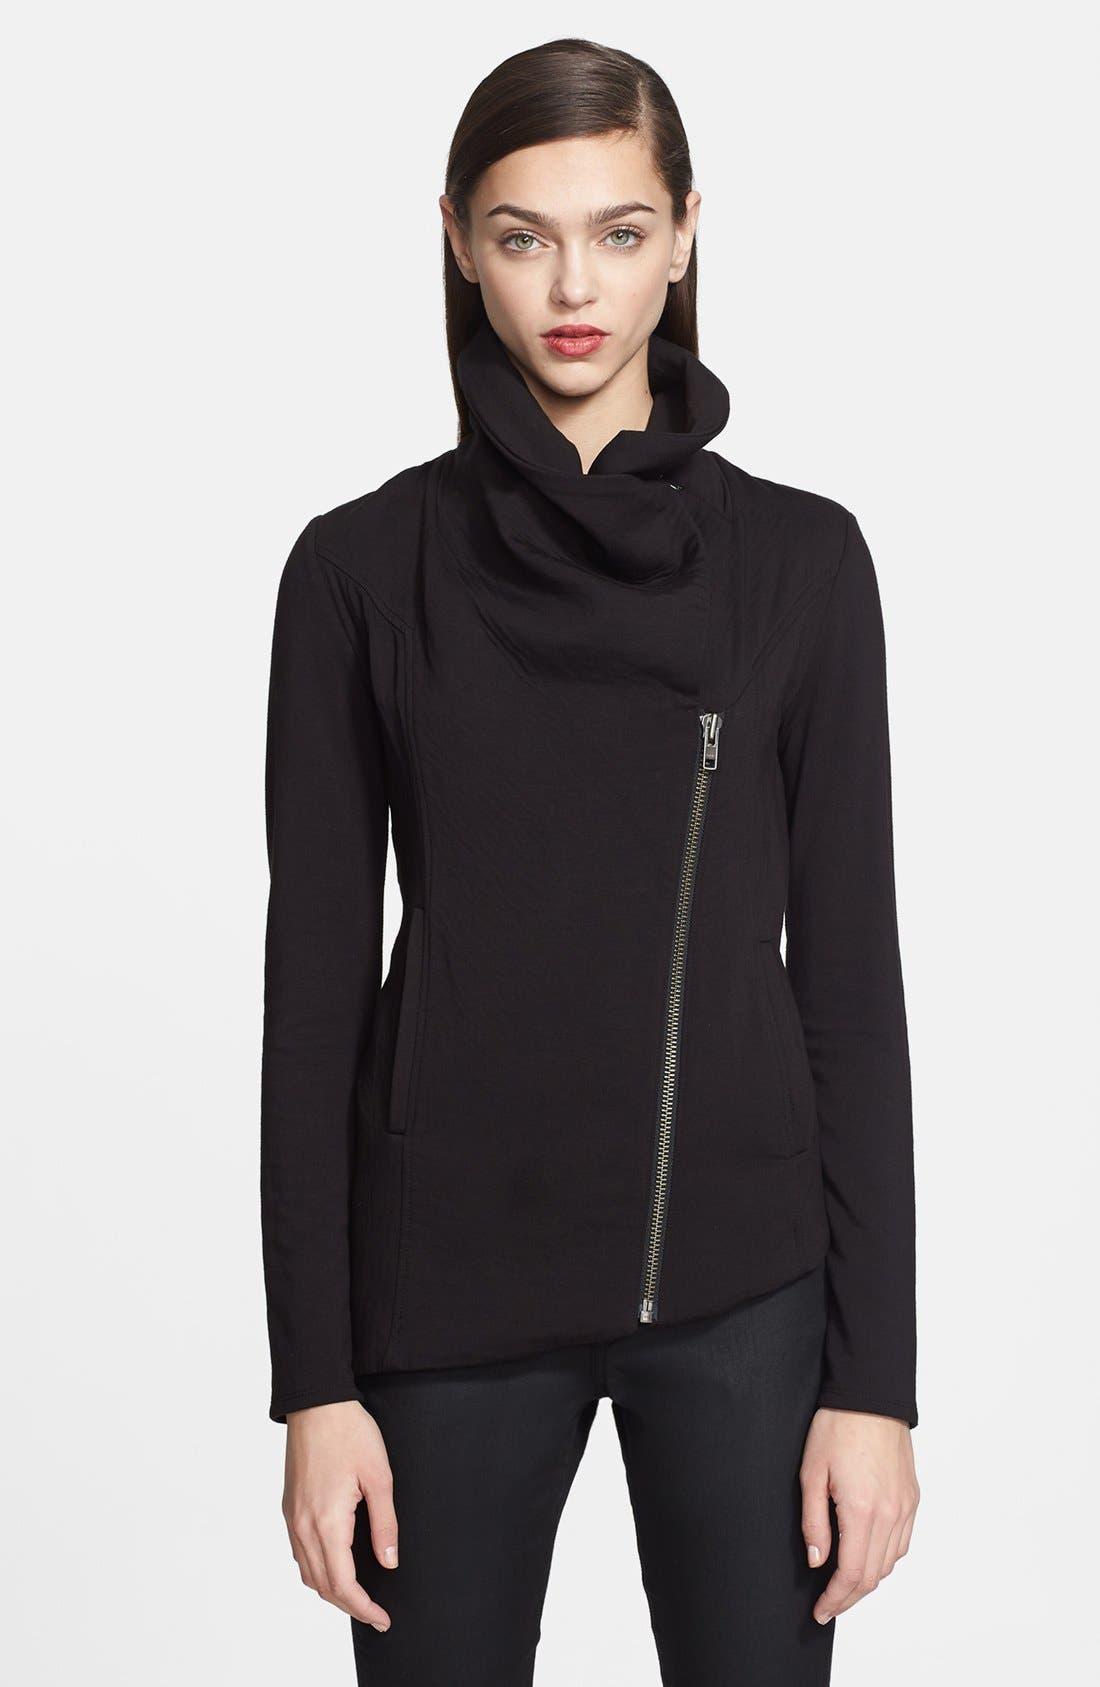 Alternate Image 1 Selected - Helmut Lang 'Villous' Zip Front Sweatshirt